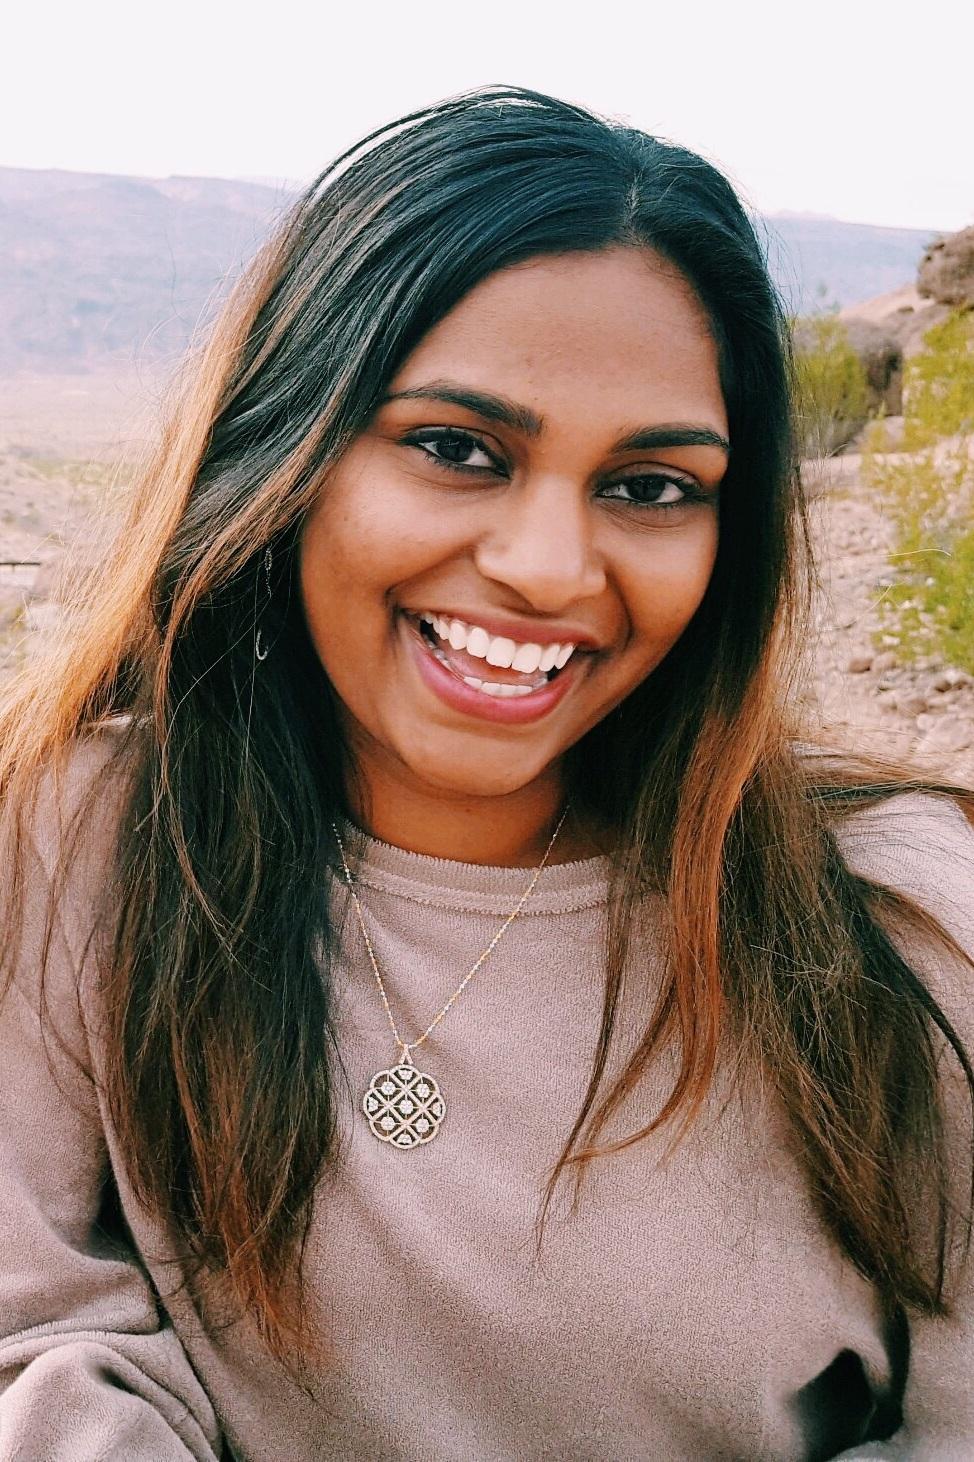 Diviya Rajesh - Biology & Race/Ethnicity StudiesTuscon, Arizona